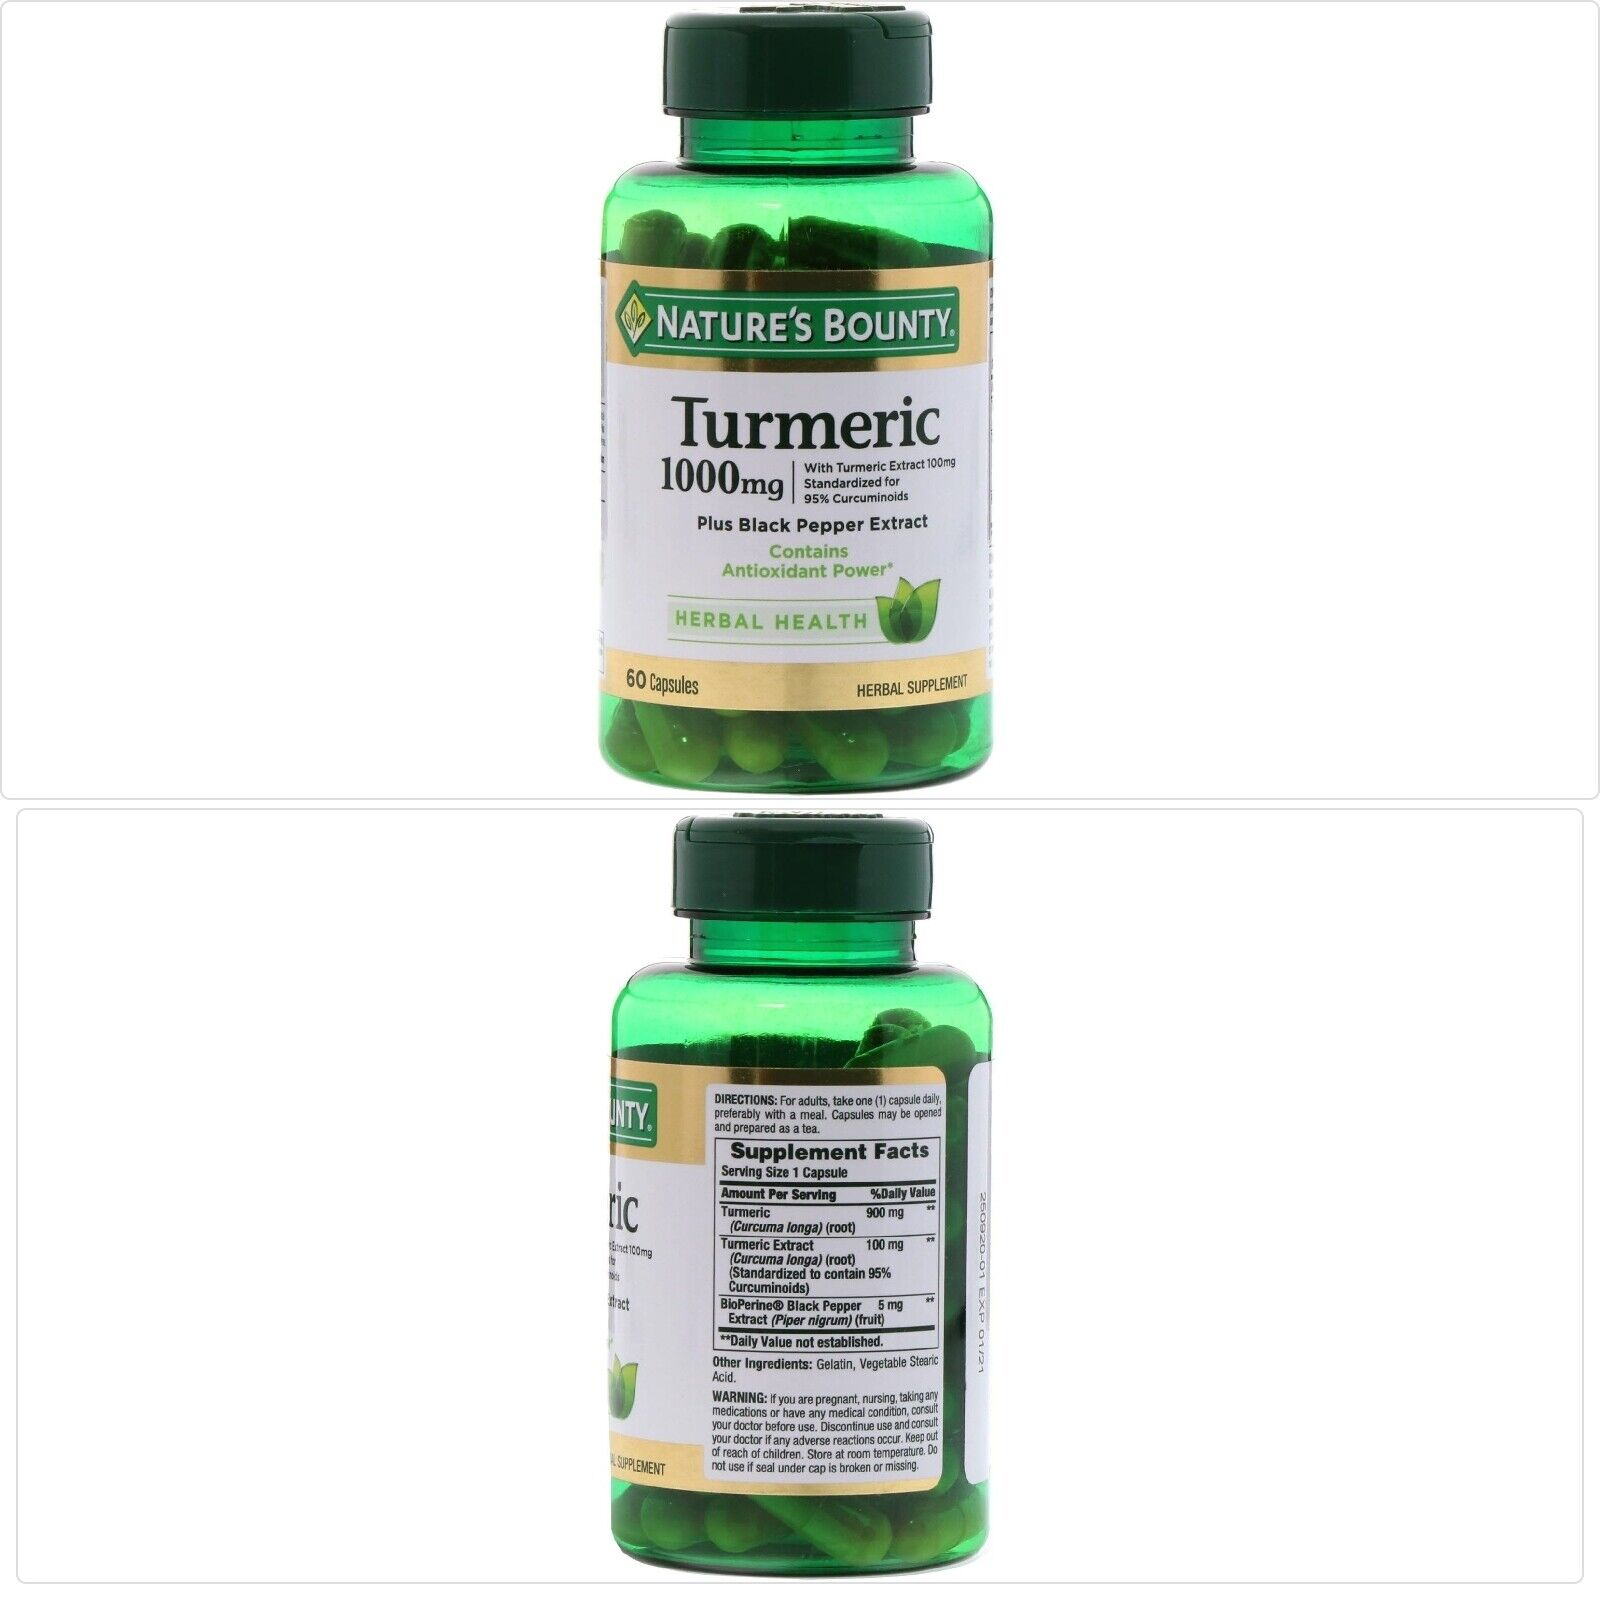 Nature's Bounty, Turmeric, 1000 mg, 60 Capsules